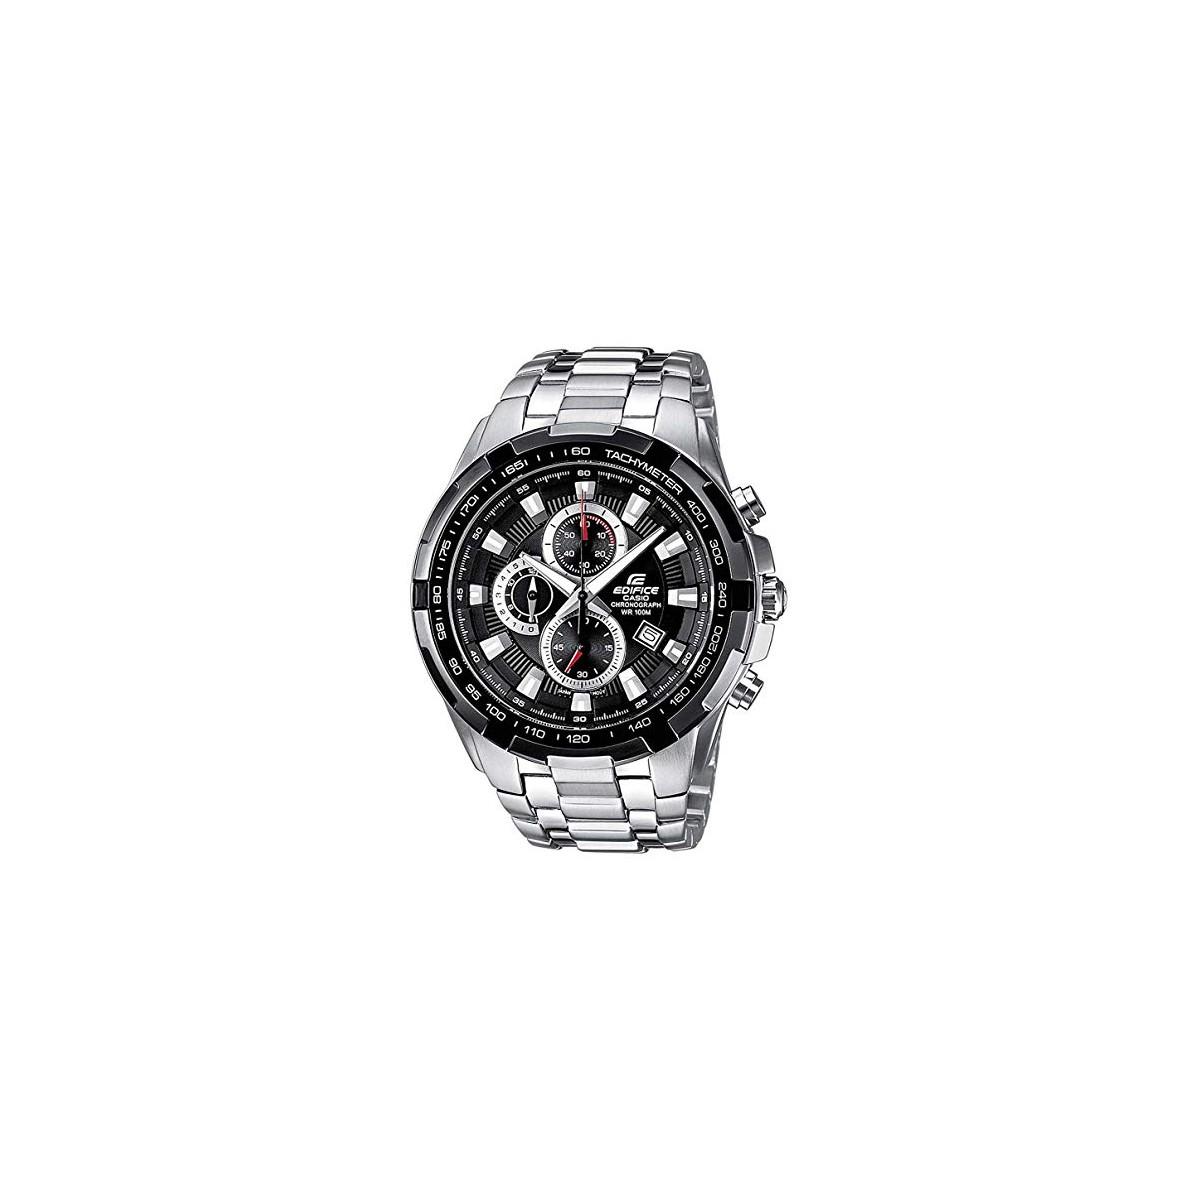 https://www.gaberjoyeria.com/4918-thickbox_default/reloj-casio-edifice.jpg